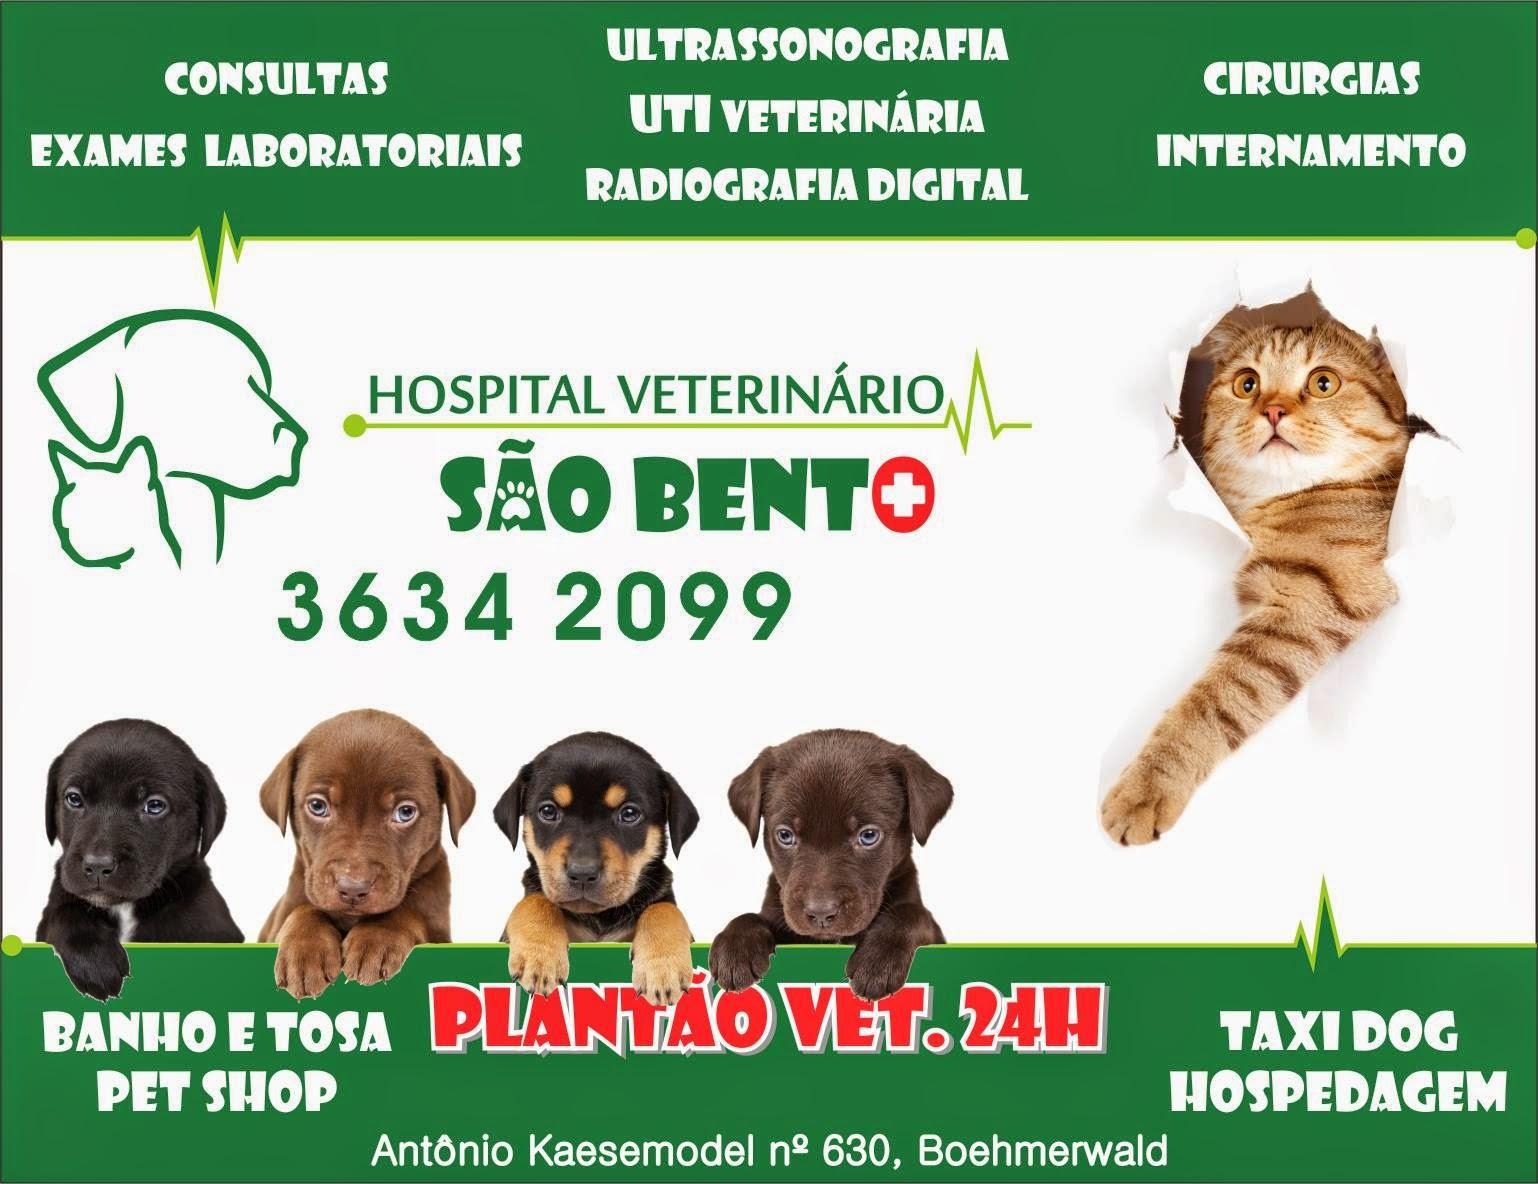 Hospital Veterinário São Bento